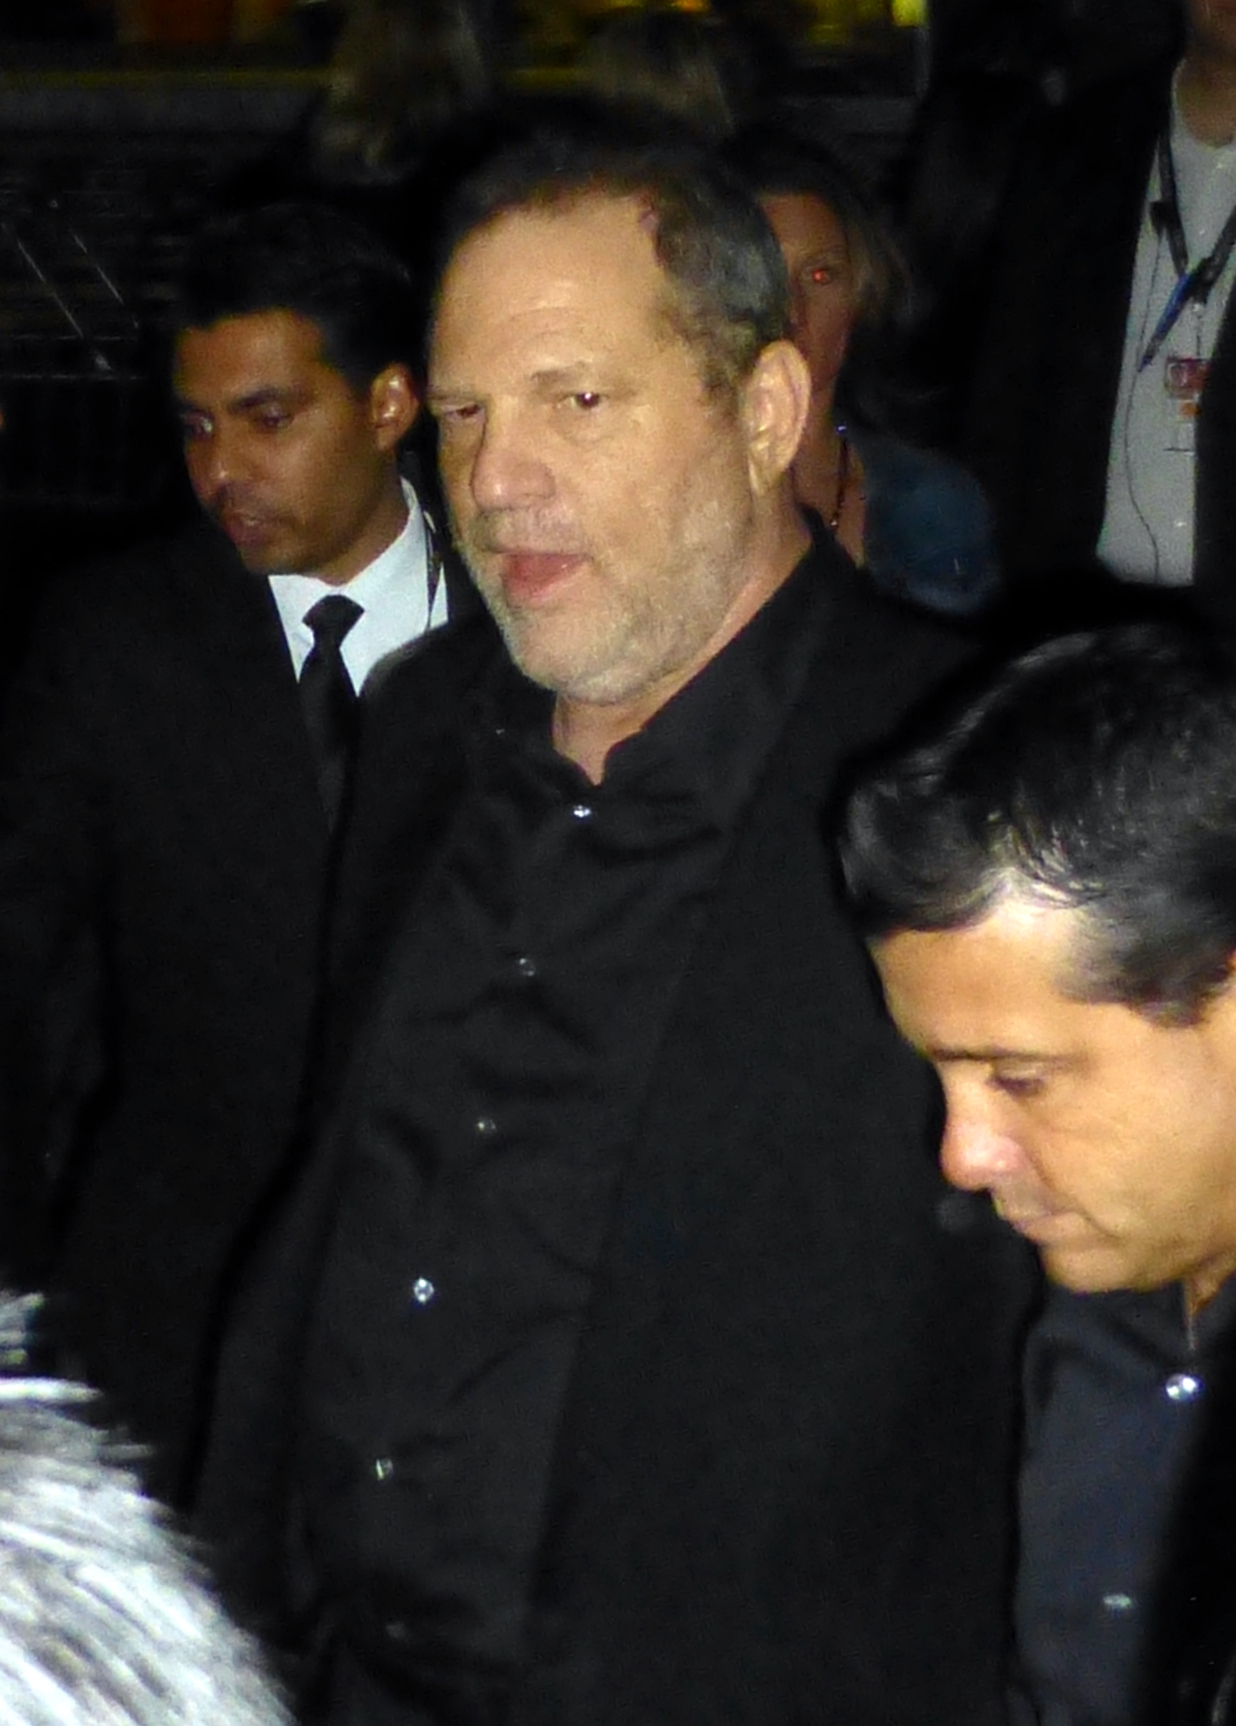 Harvey Weinstein, communication autocentrée, chute précipitée